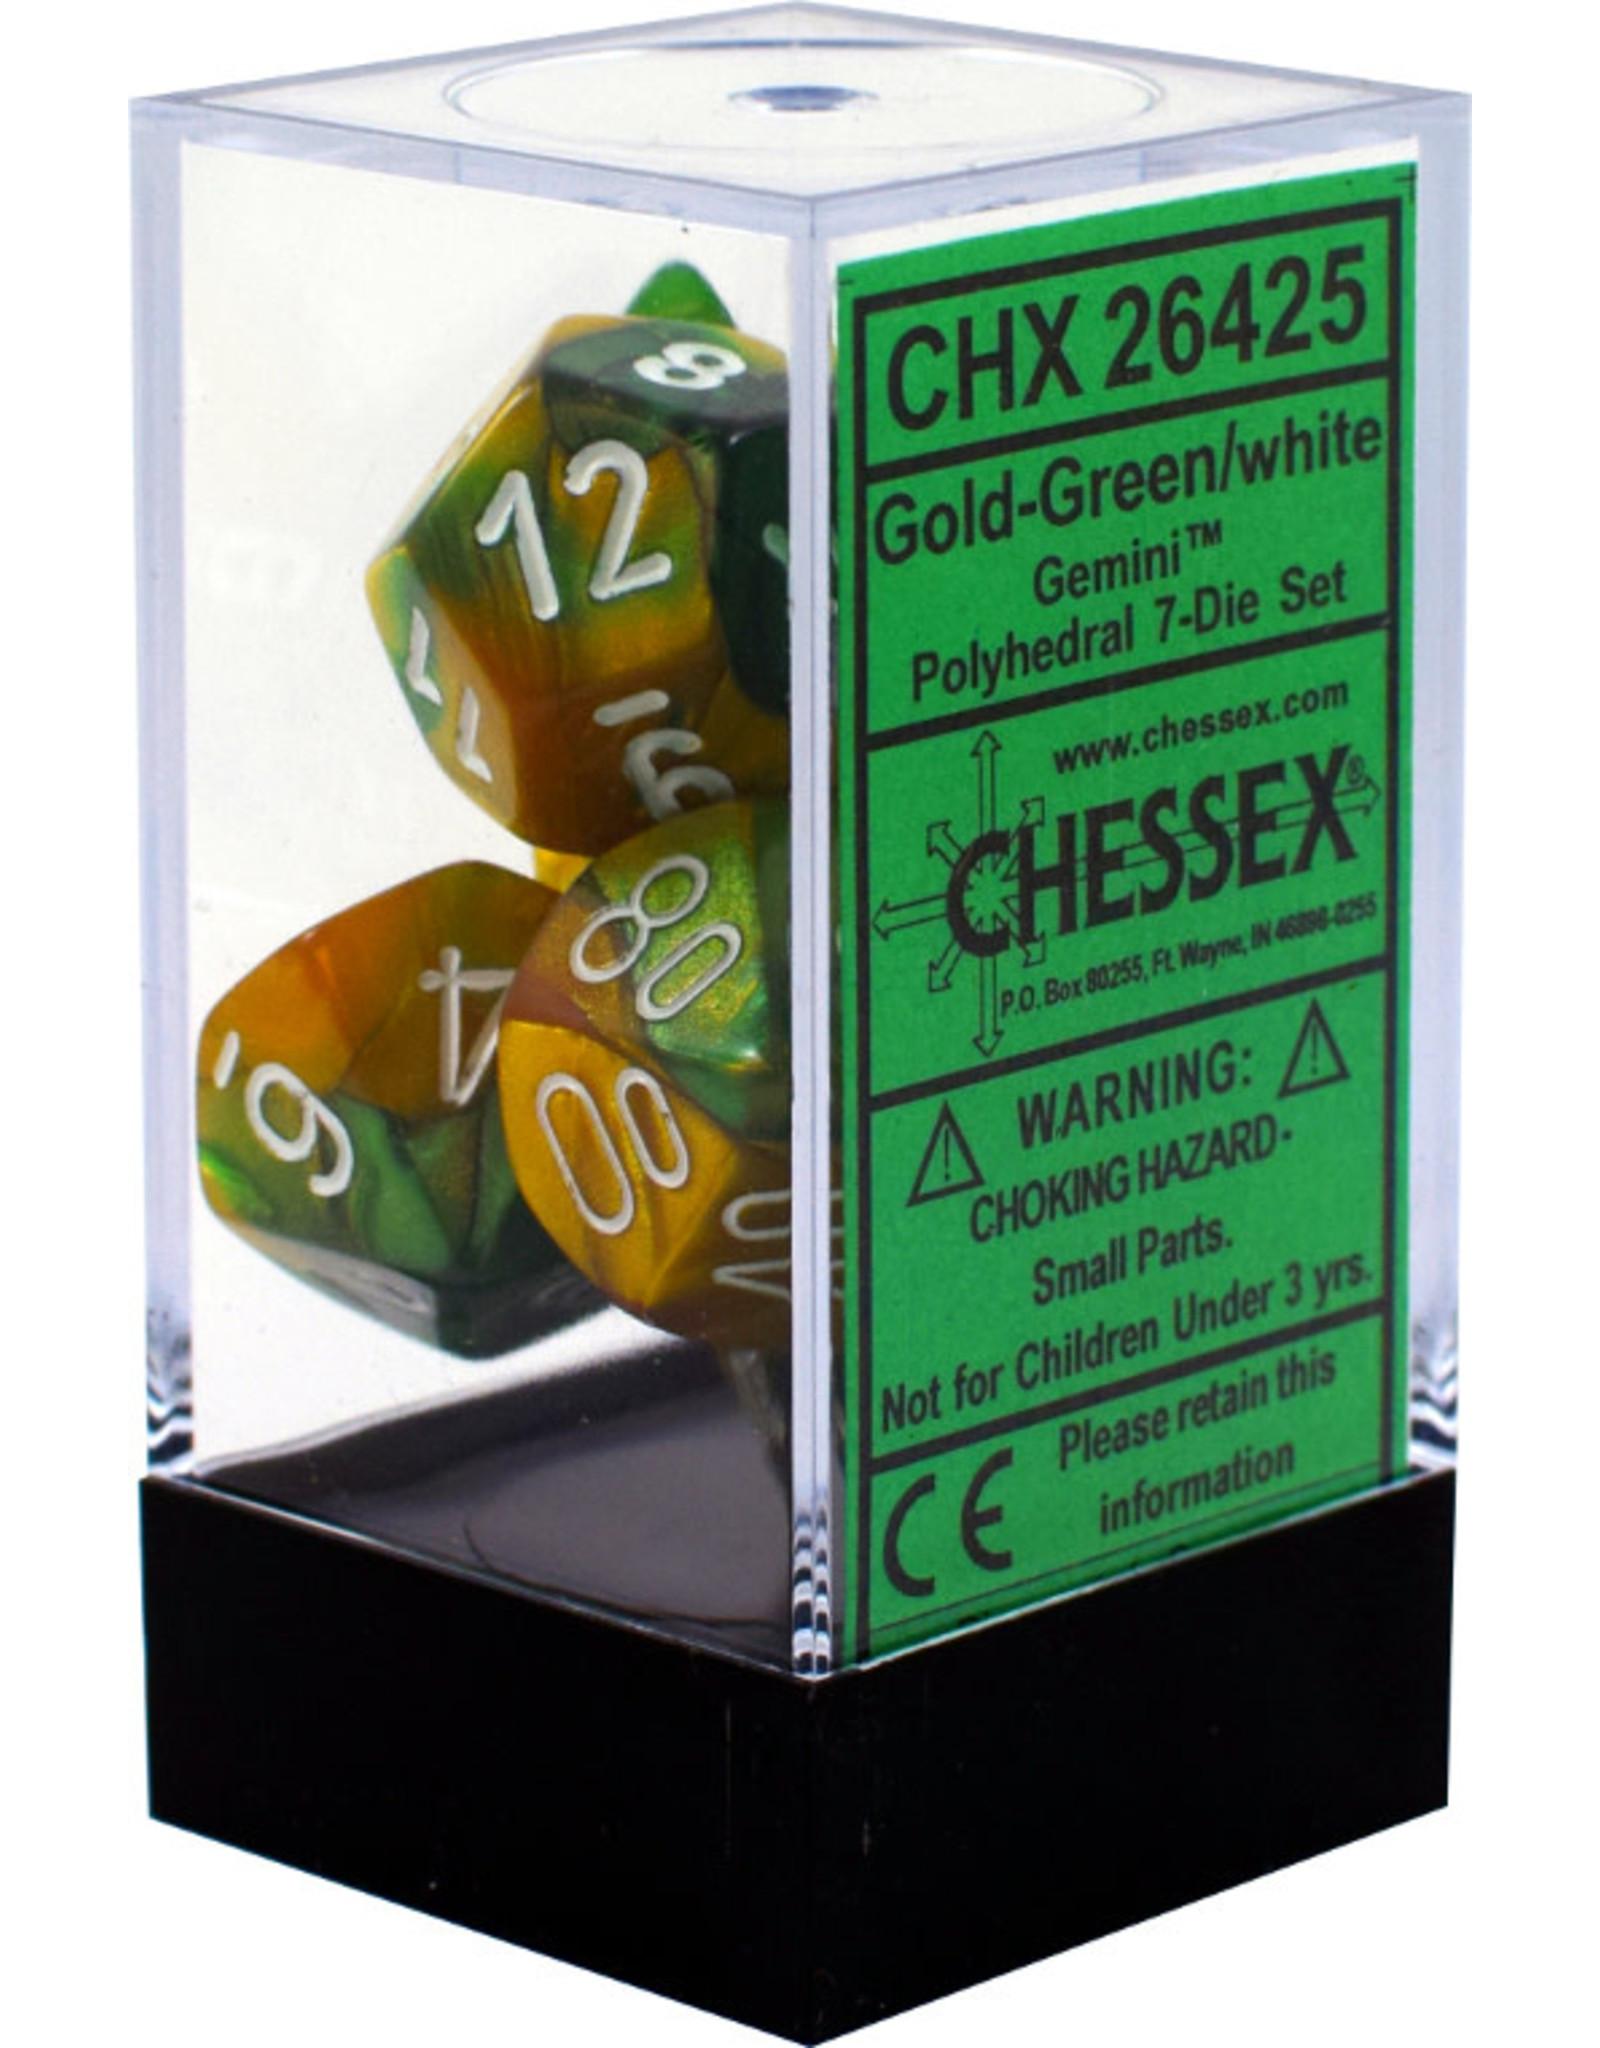 Chessex Gemini Gold-Green/white Polyhedral 7-Die Set